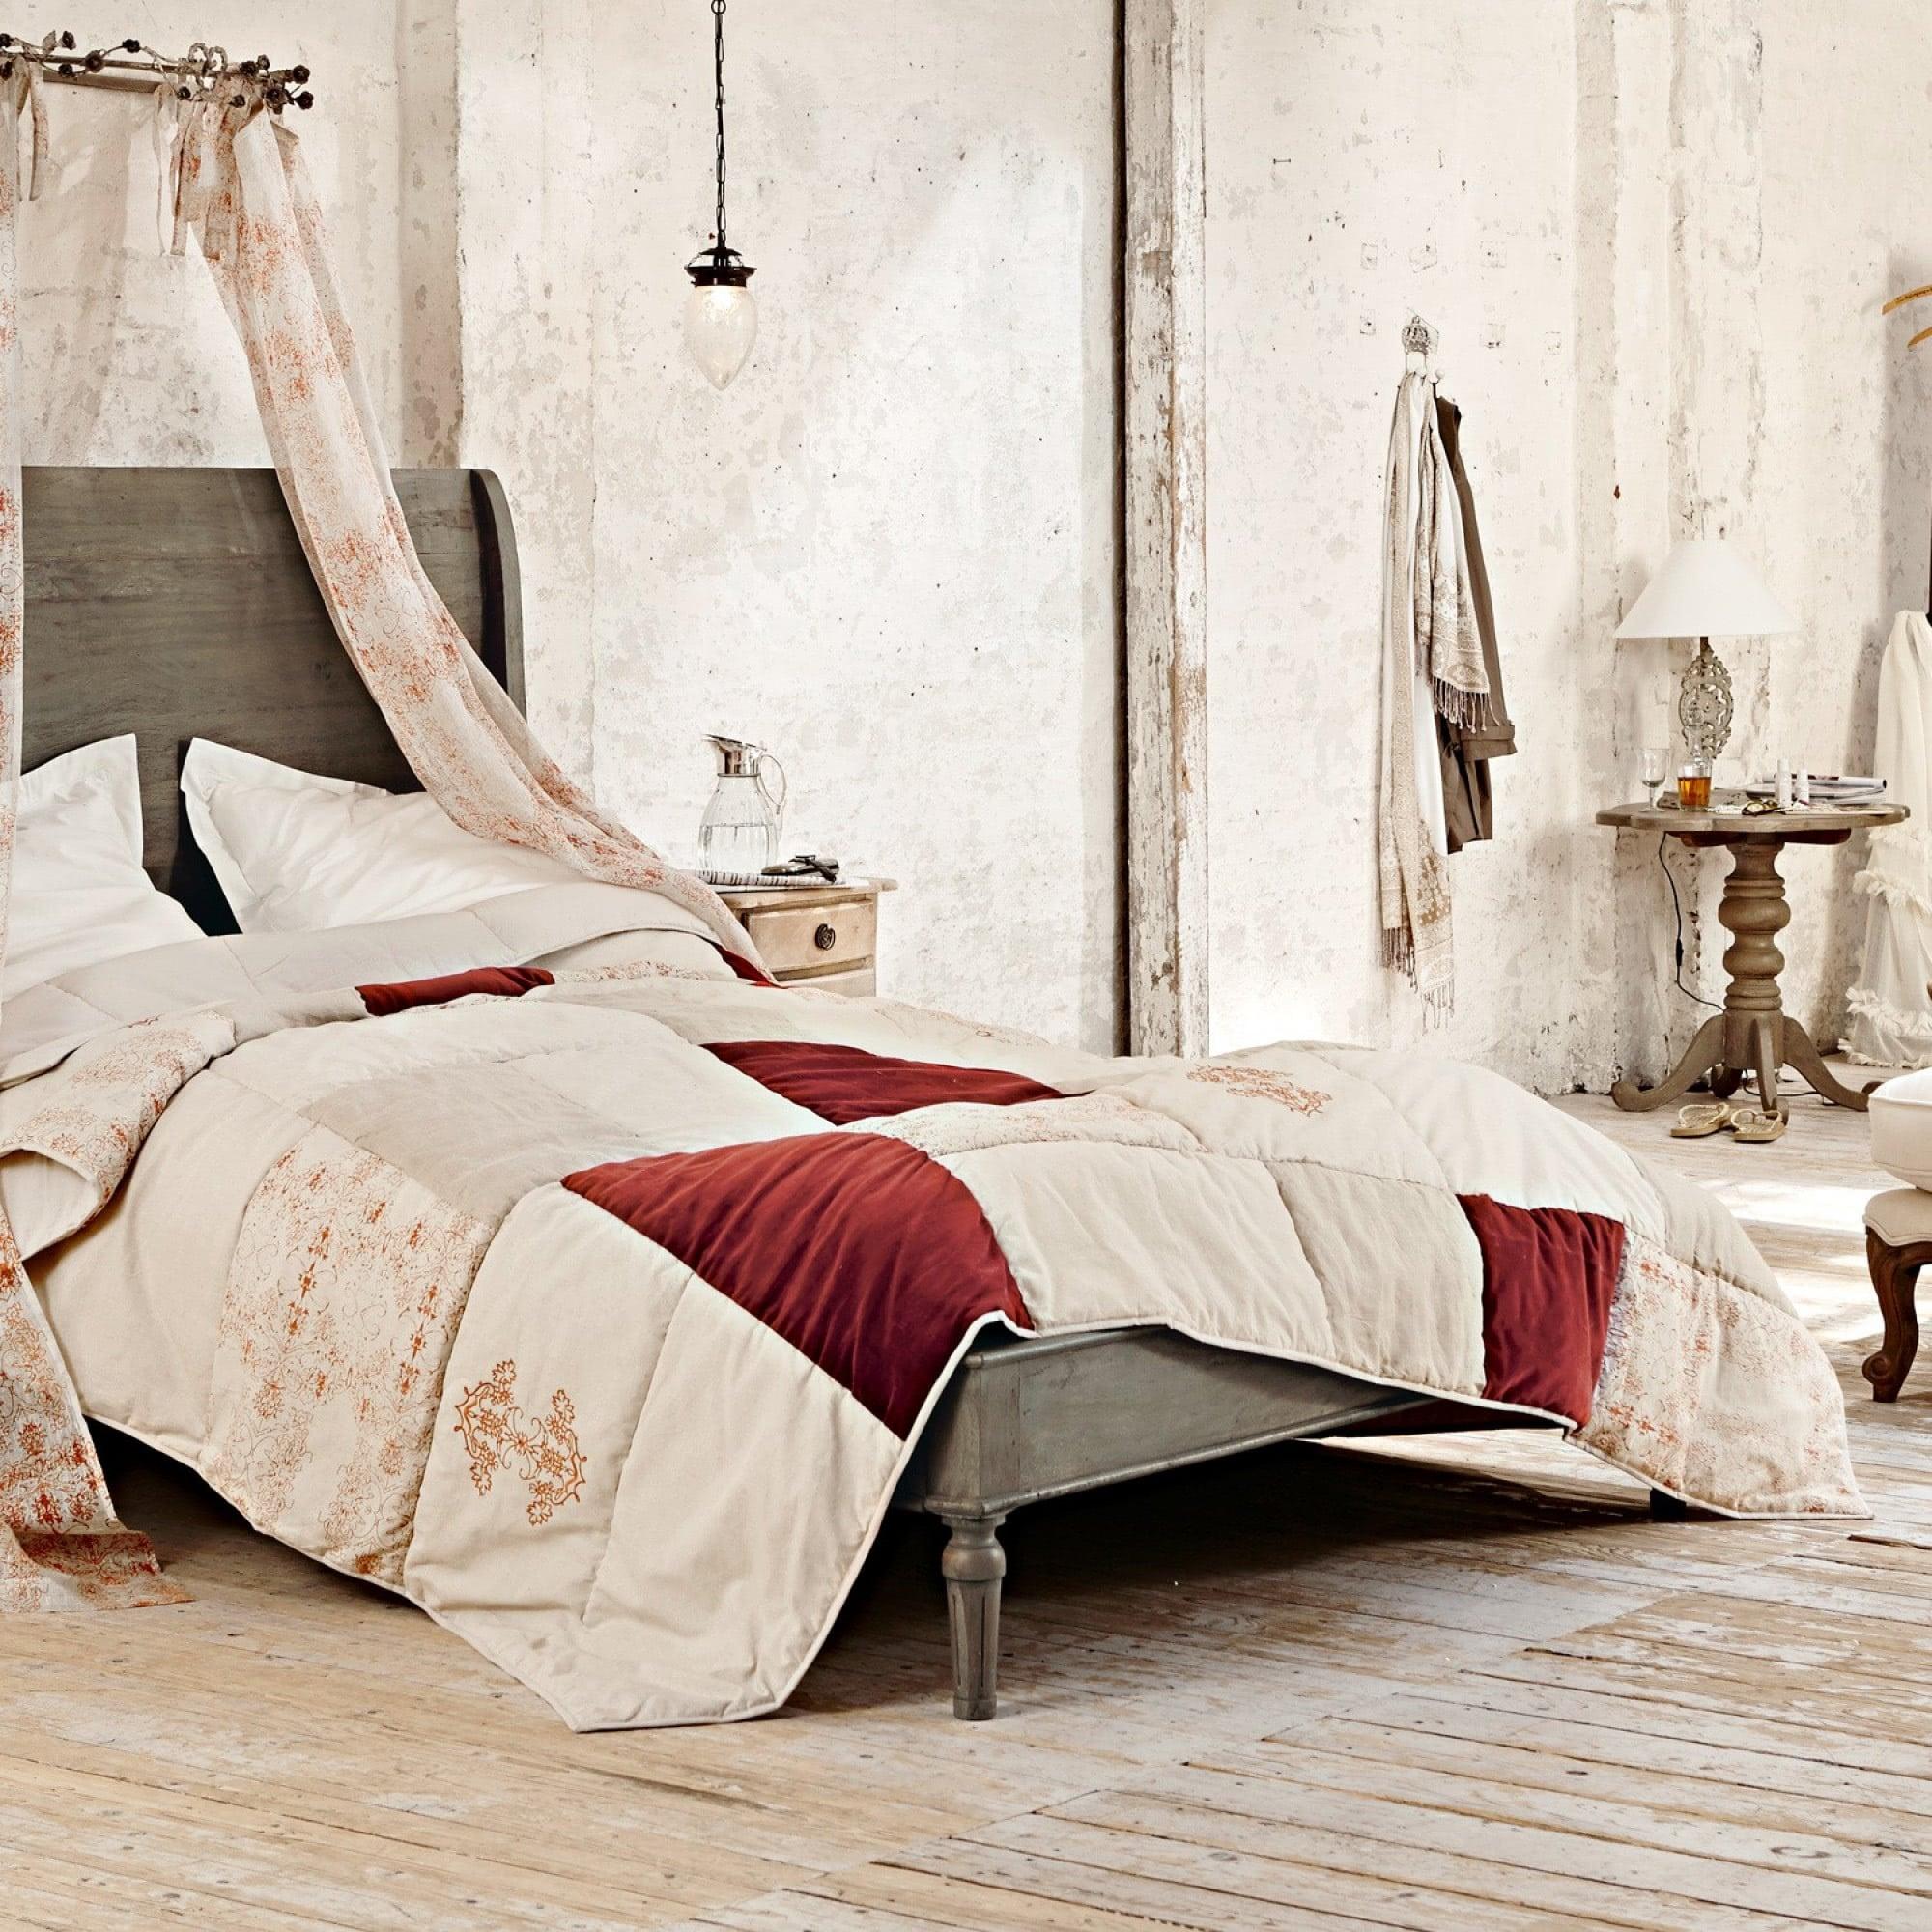 quilt gronard loberon coming home. Black Bedroom Furniture Sets. Home Design Ideas